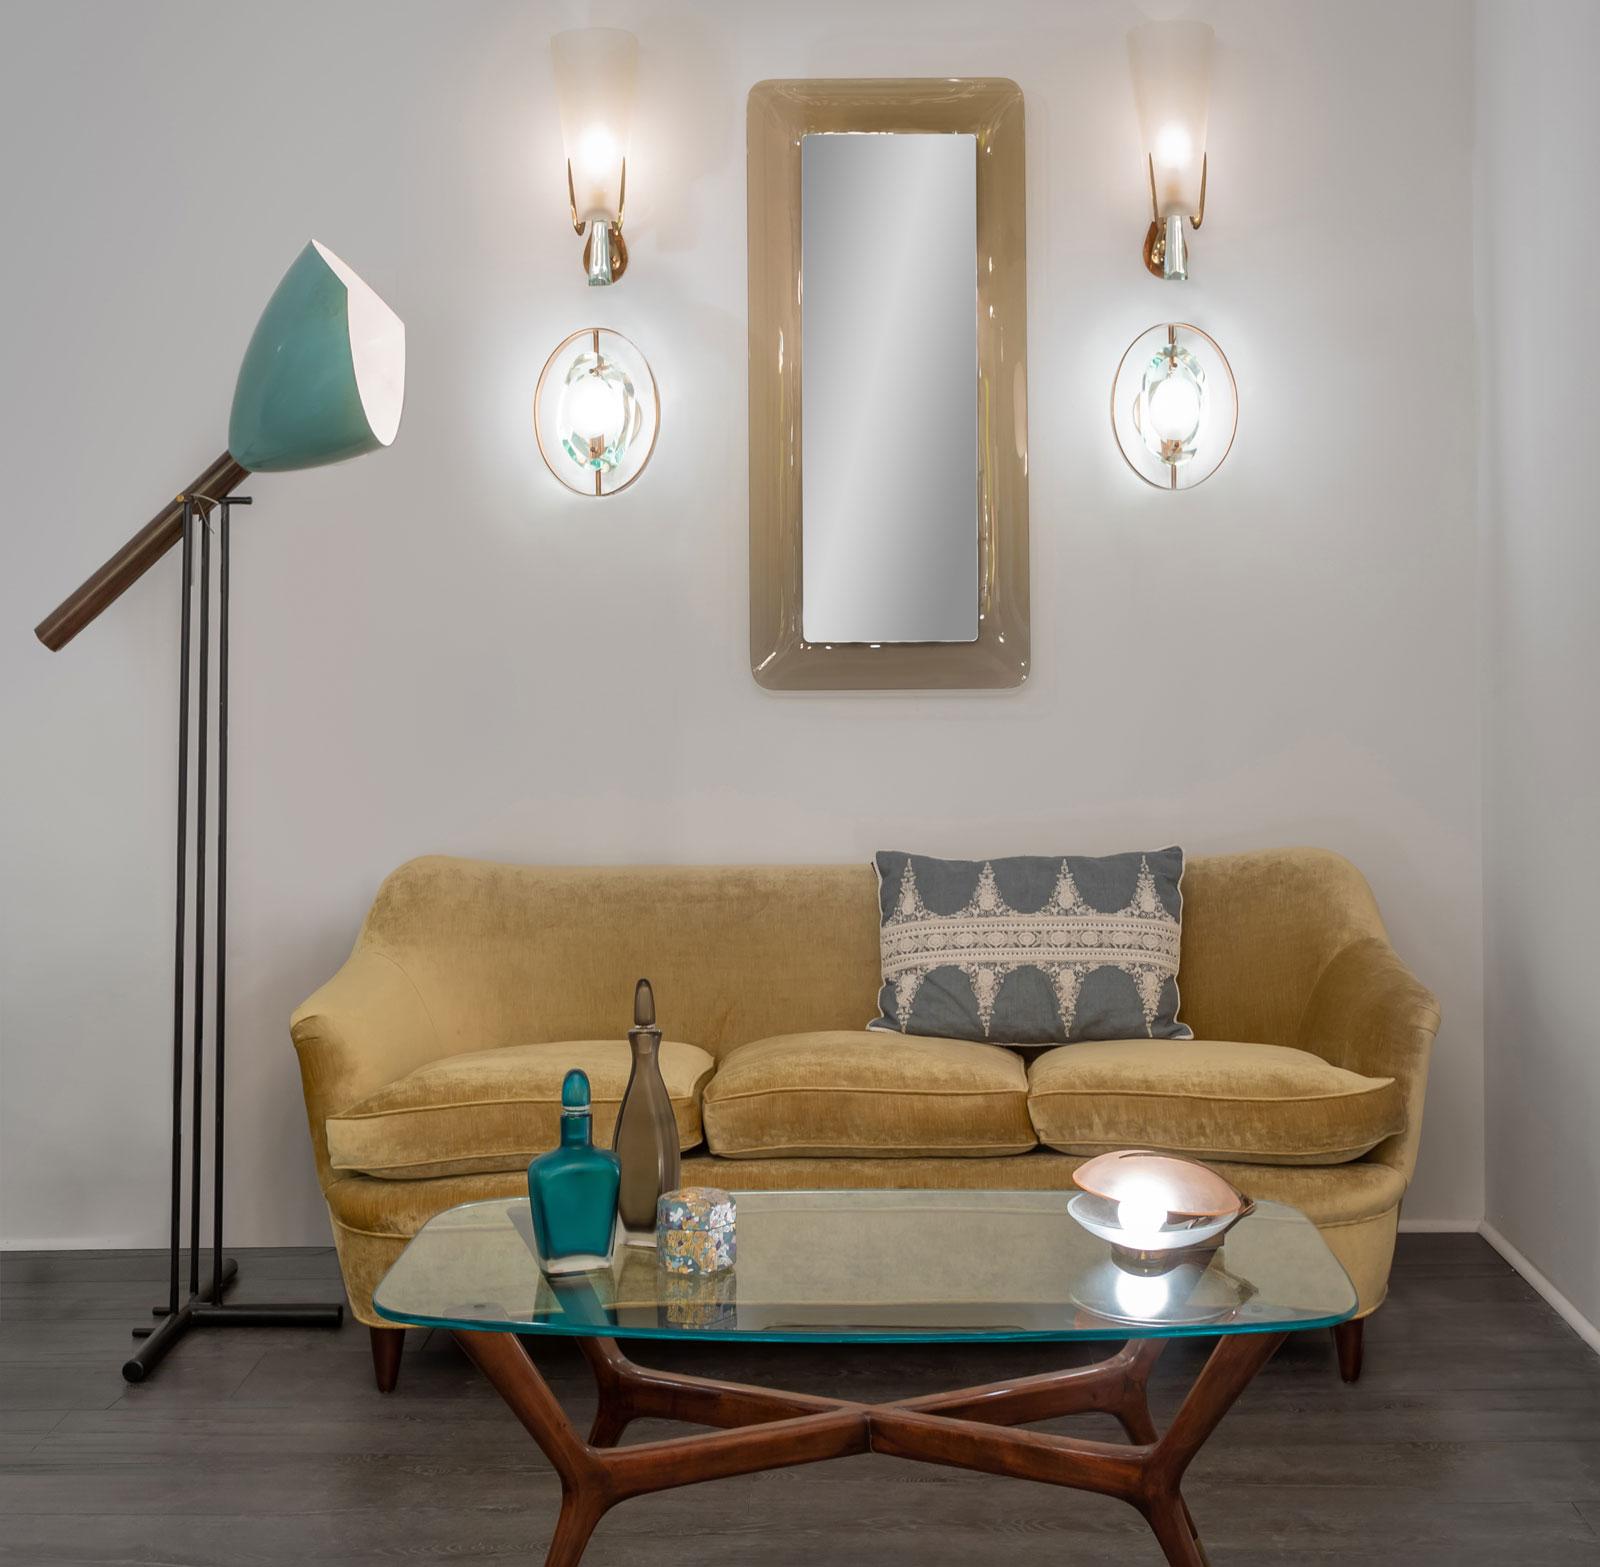 ponti-sofa-tele-lamp-fa-sconces-1-optimized by    soyun k.